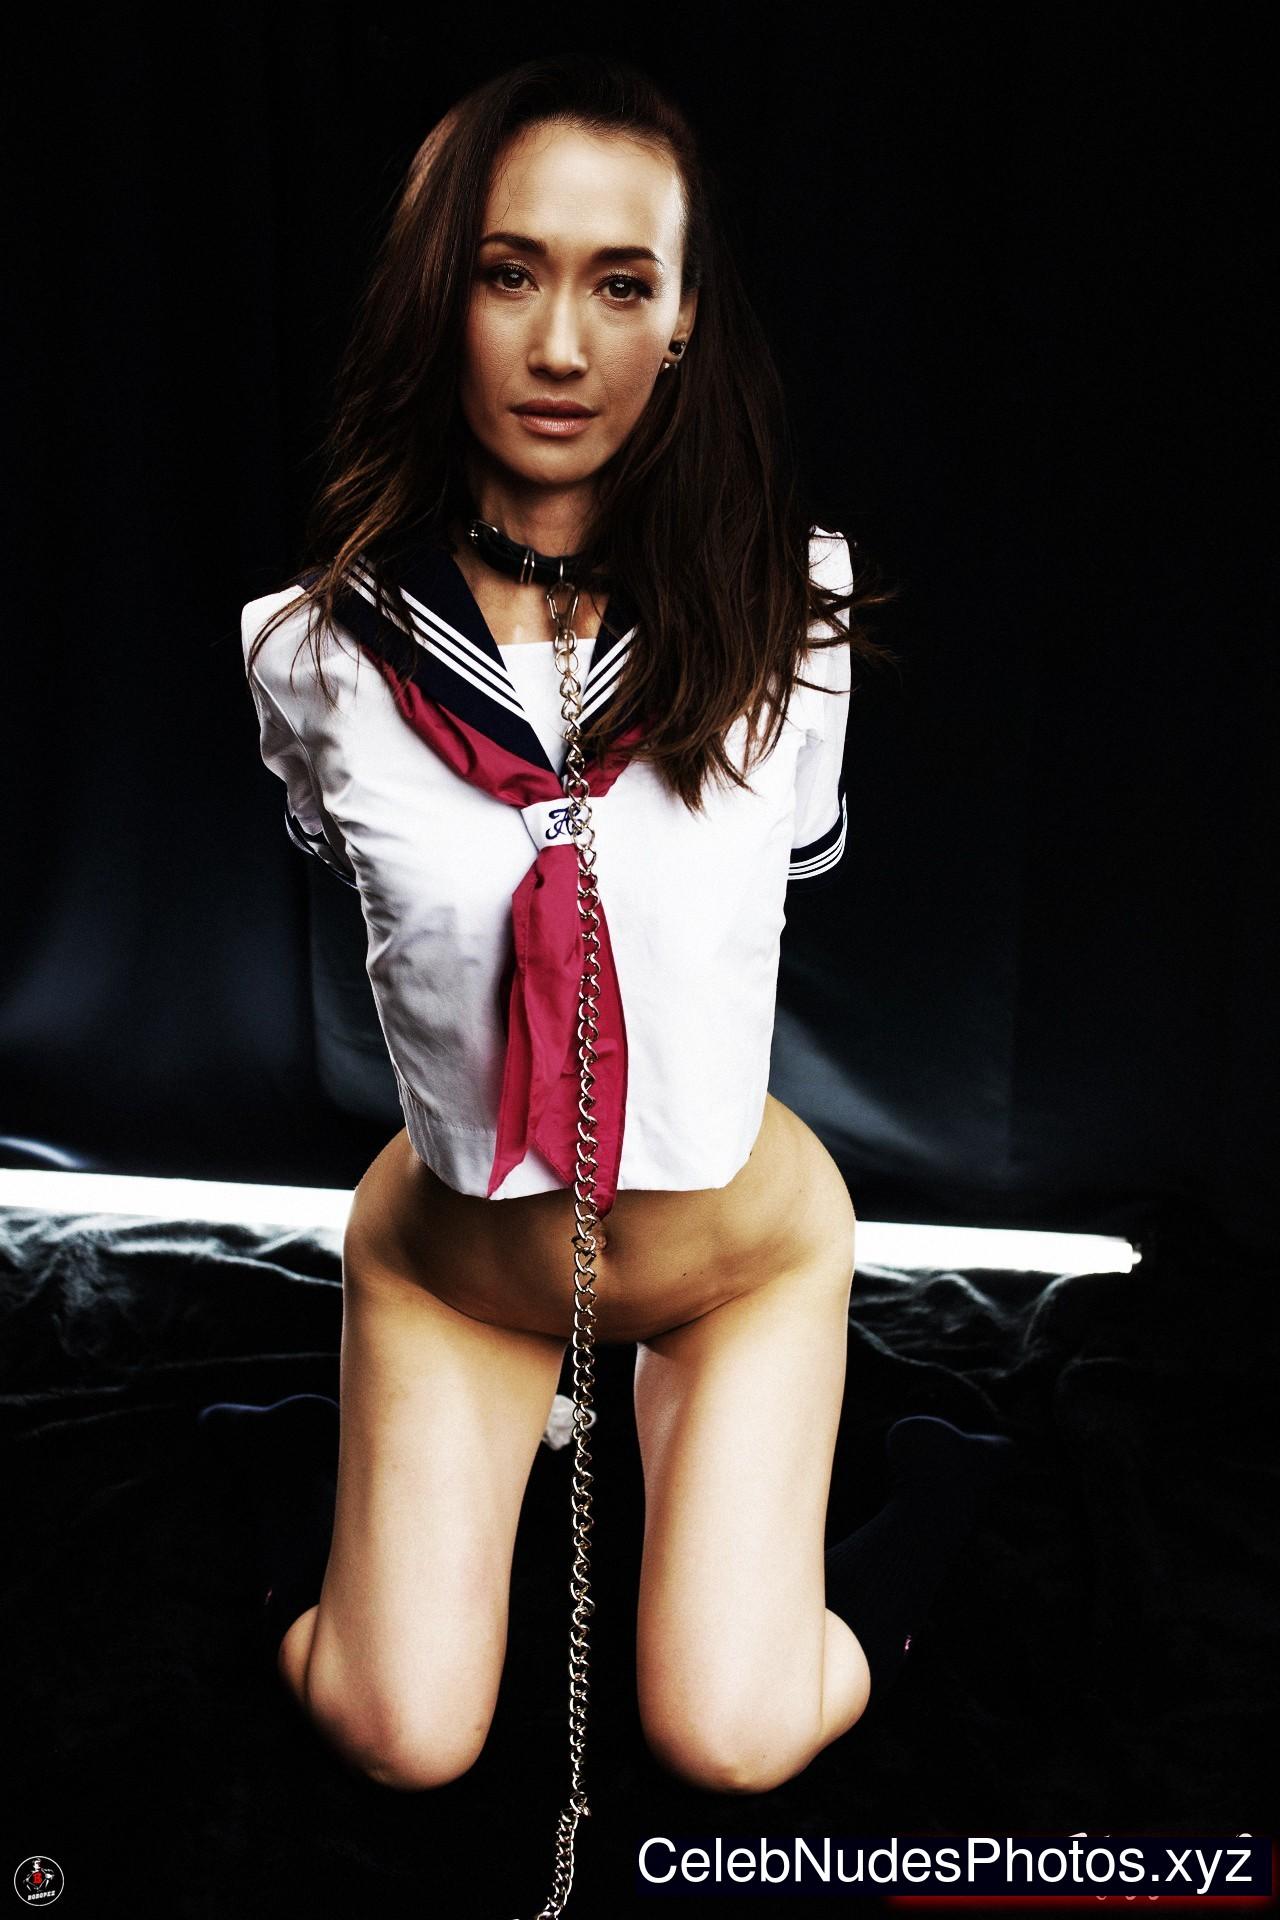 Maggie Quigley celeb nude